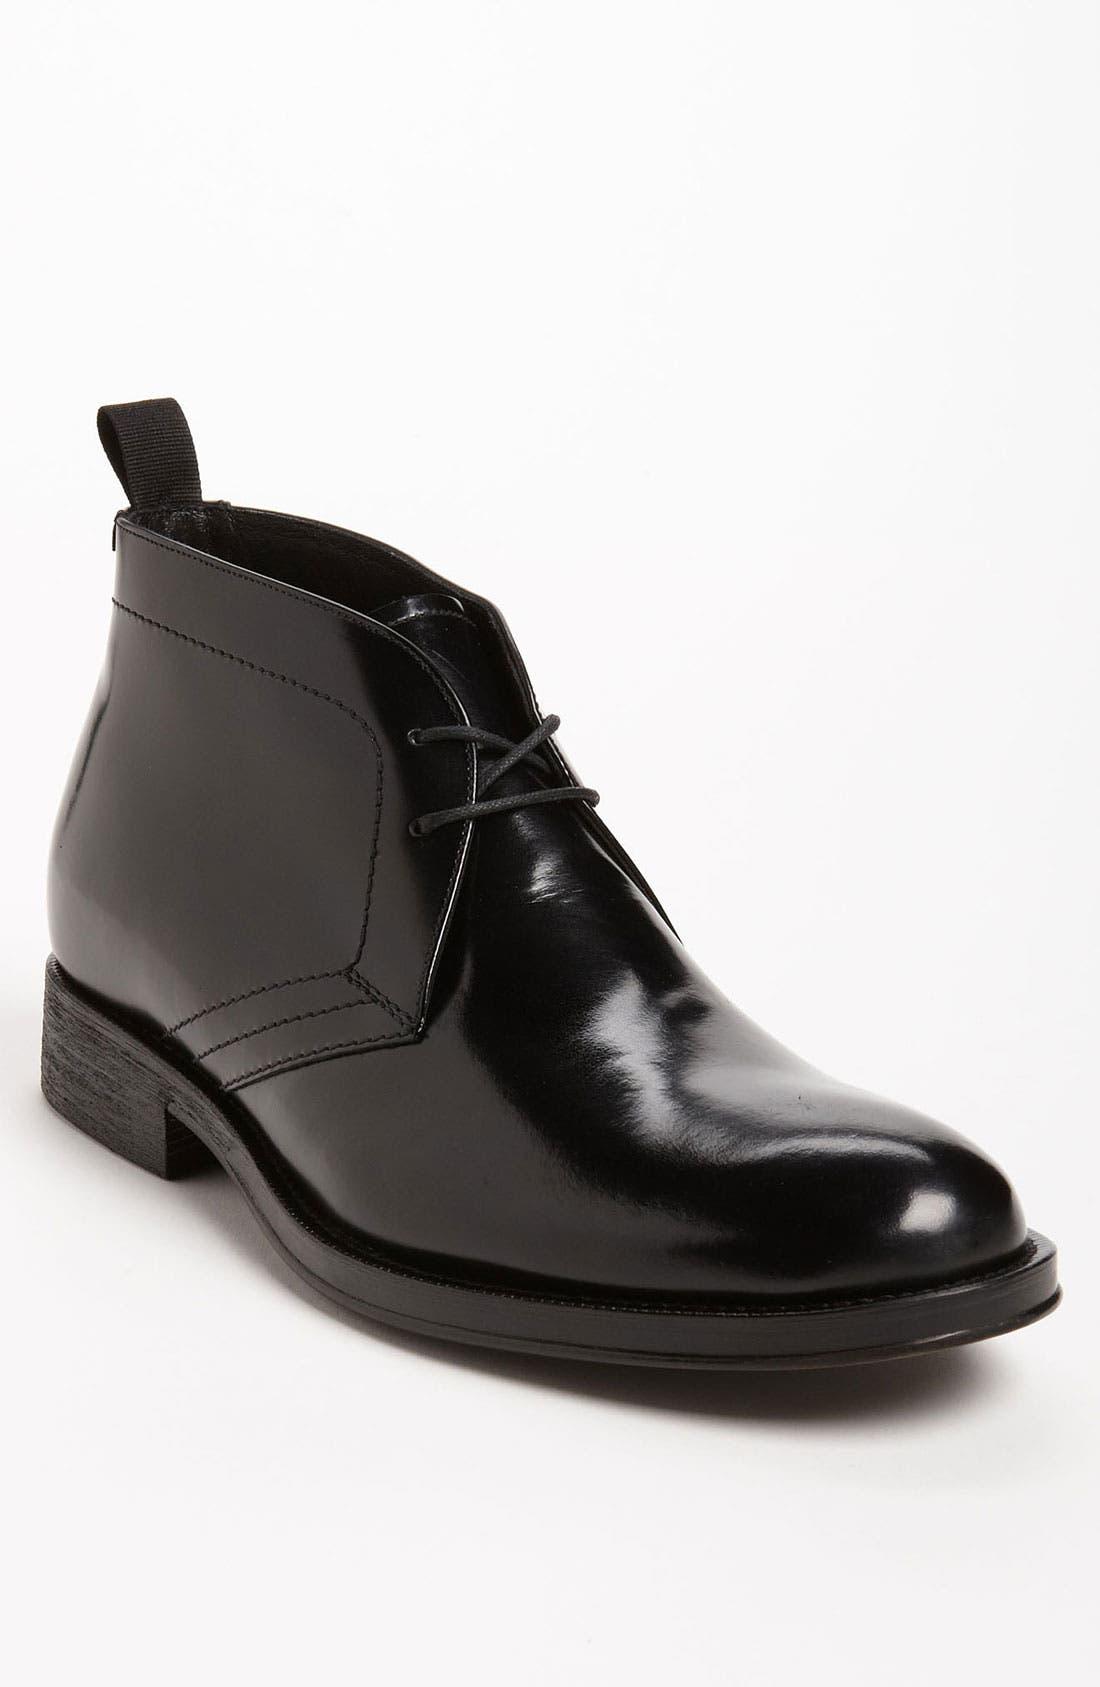 Main Image - Mr. B's for ALDO 'Nicholas' Chukka Boot